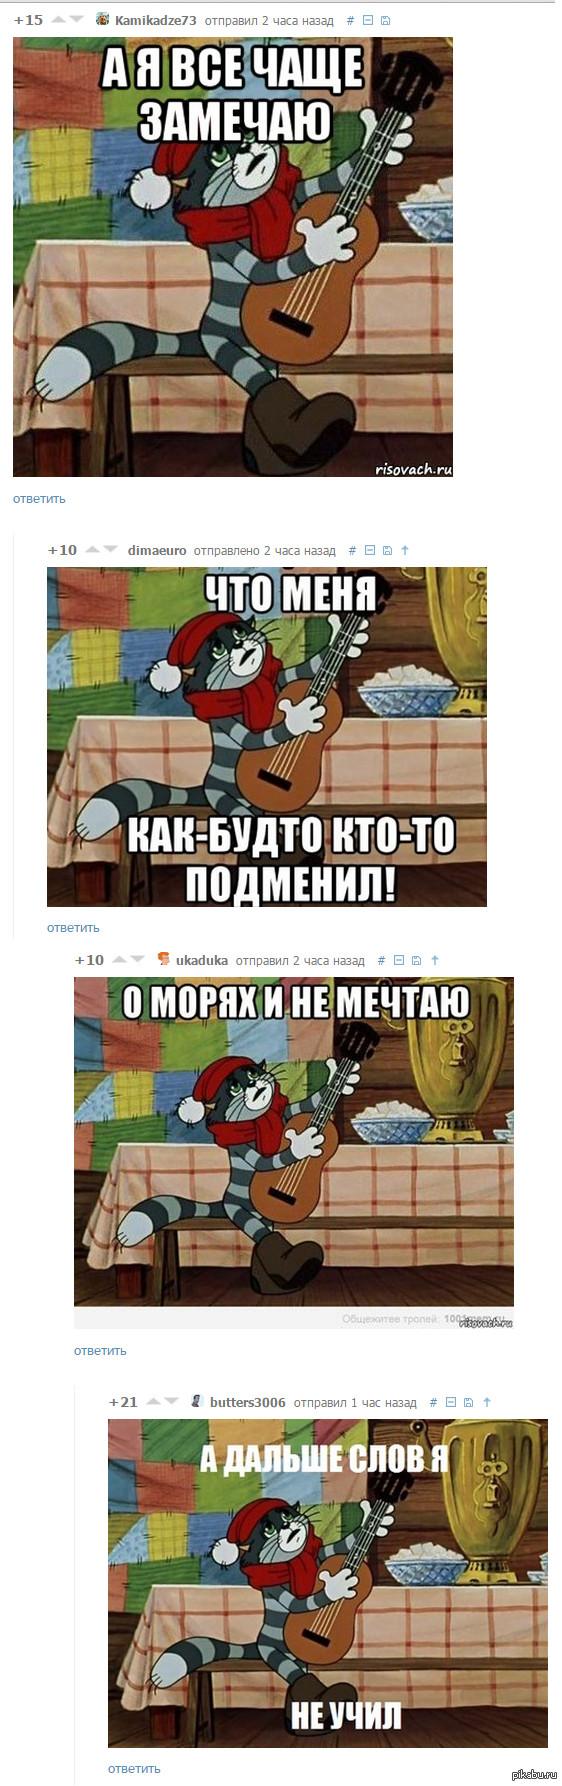 "Комментарии не могут не радовать <a href=""http://pikabu.ru/story/argonianskiy_bard_3129400"">http://pikabu.ru/story/_3129400</a>"